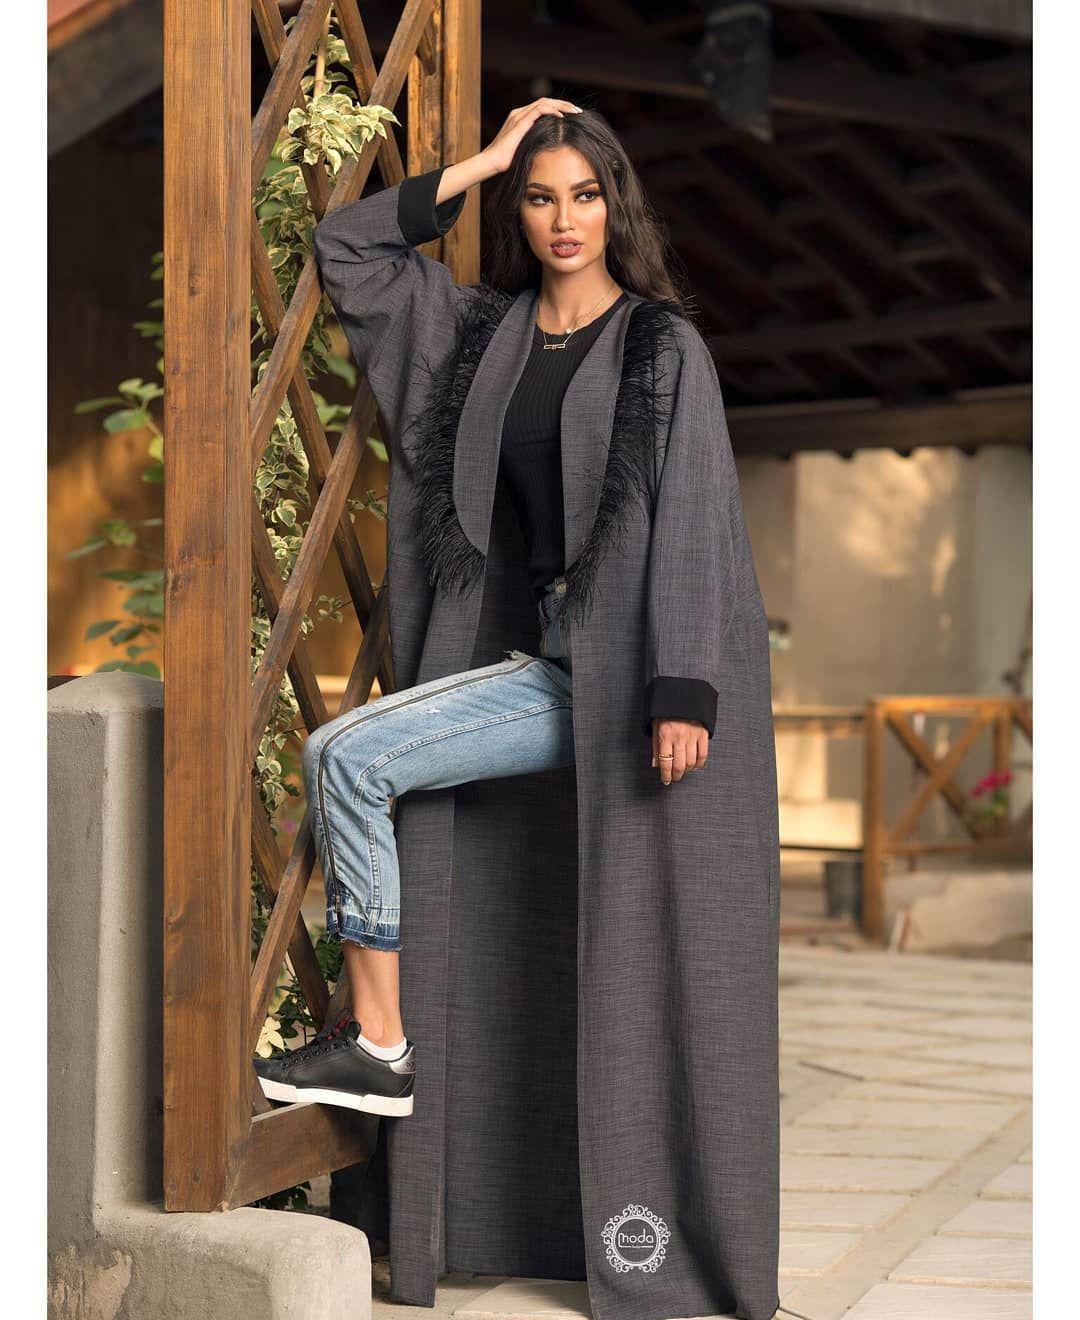 سيدتي من اجلكم يستحق الابداع Eid Collection 2018 M O D A D E S I G N مجموعة العيد 2018 Iranian Women Fashion Stylish Work Outfits Persian Fashion